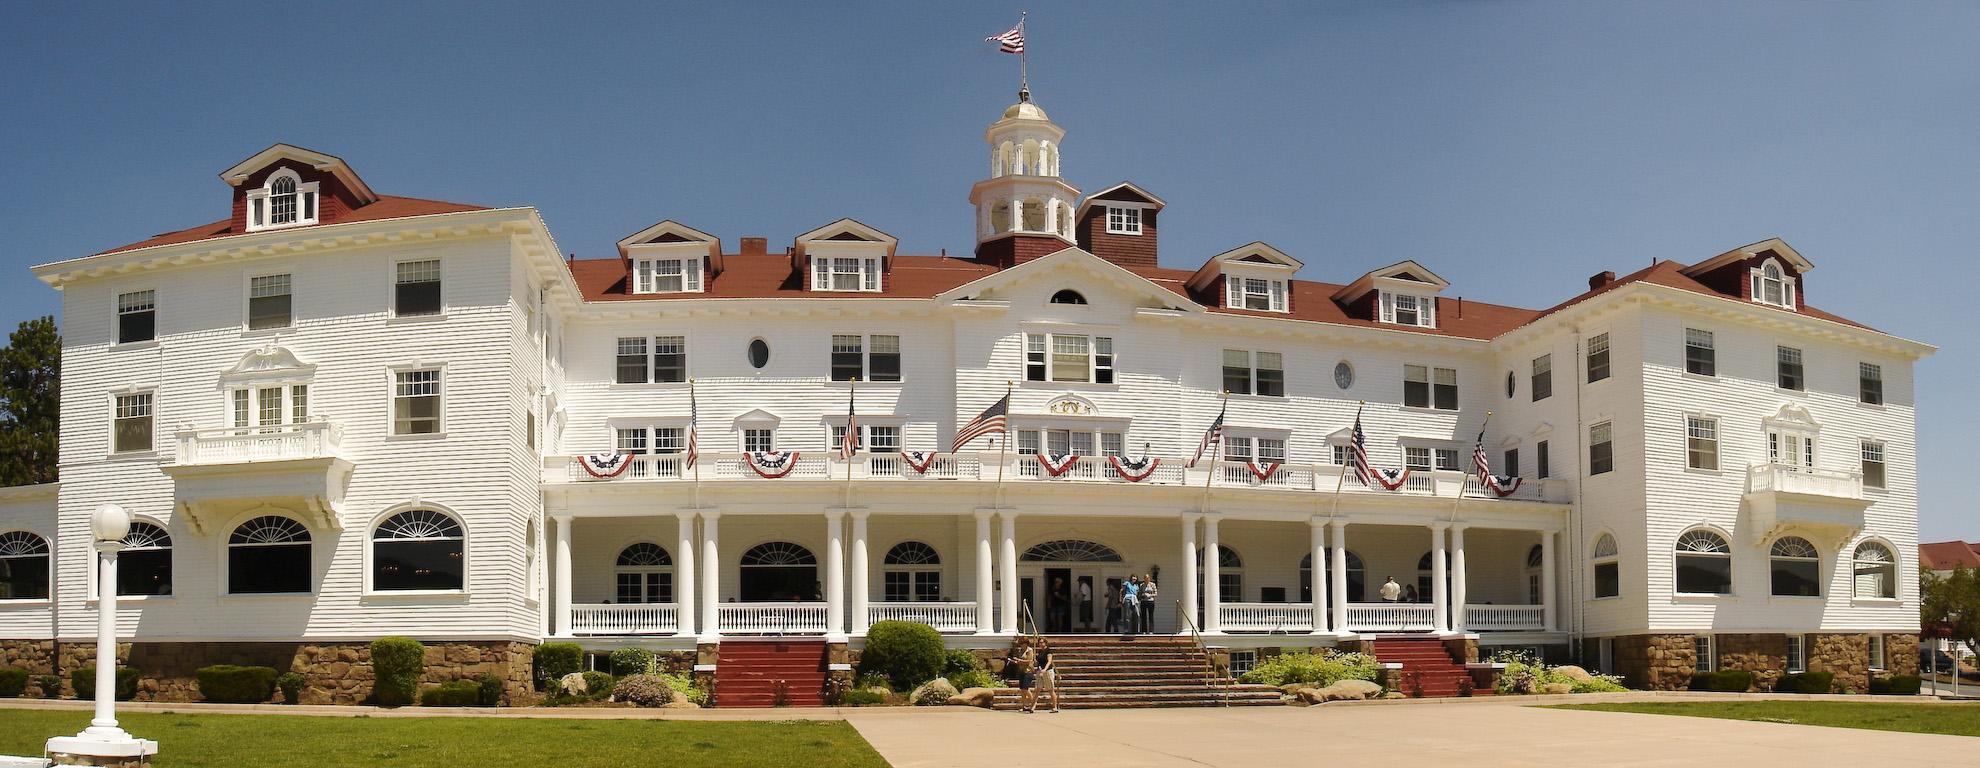 Hotels Near National Rehab Hospital Washington Dc